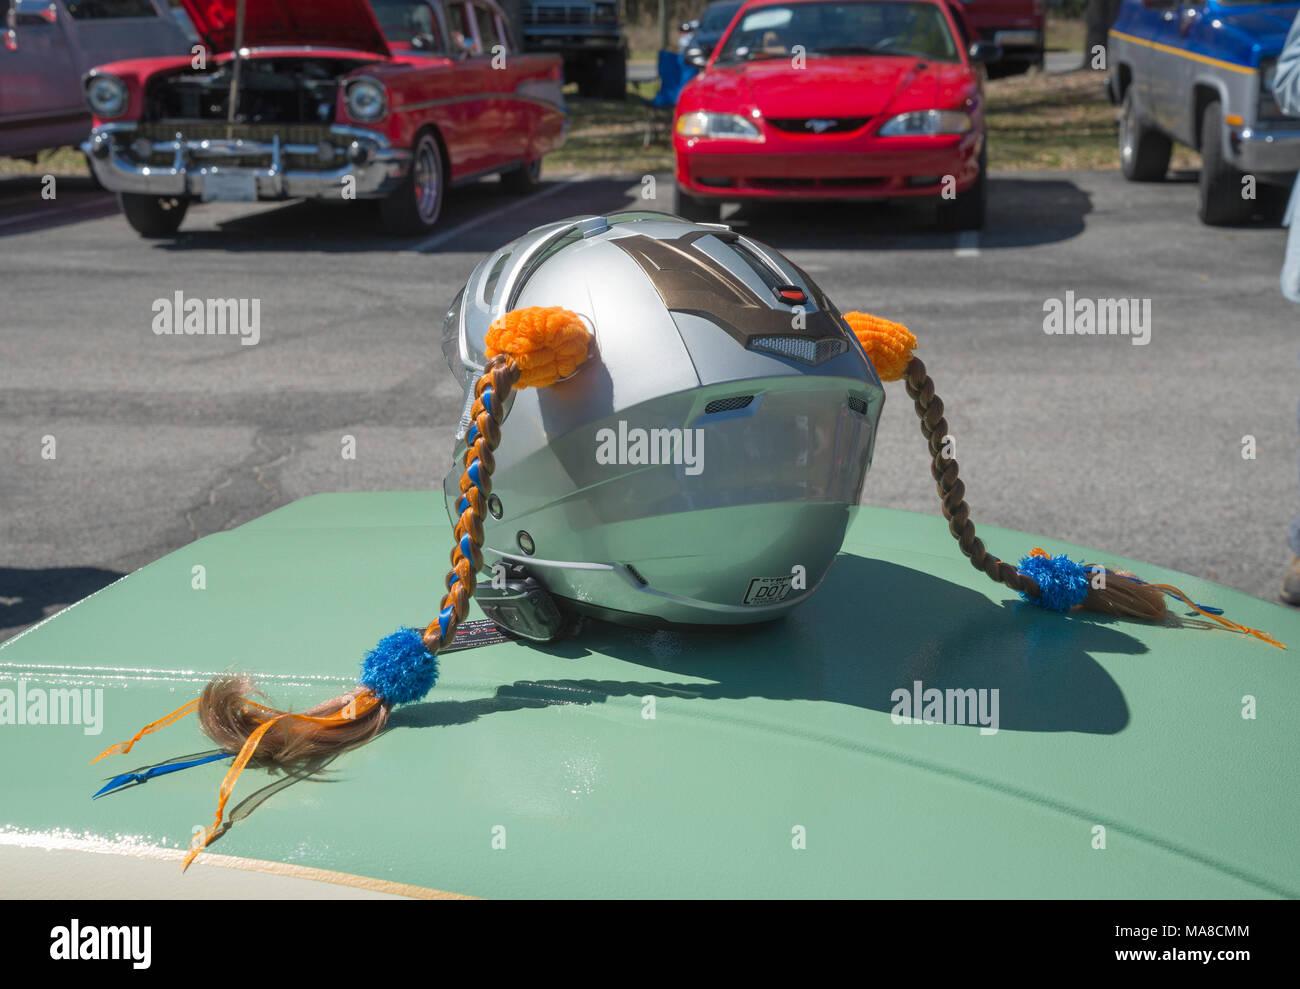 Customized motorcycle stock photos customized motorcycle for Beachside motors ludlow ma